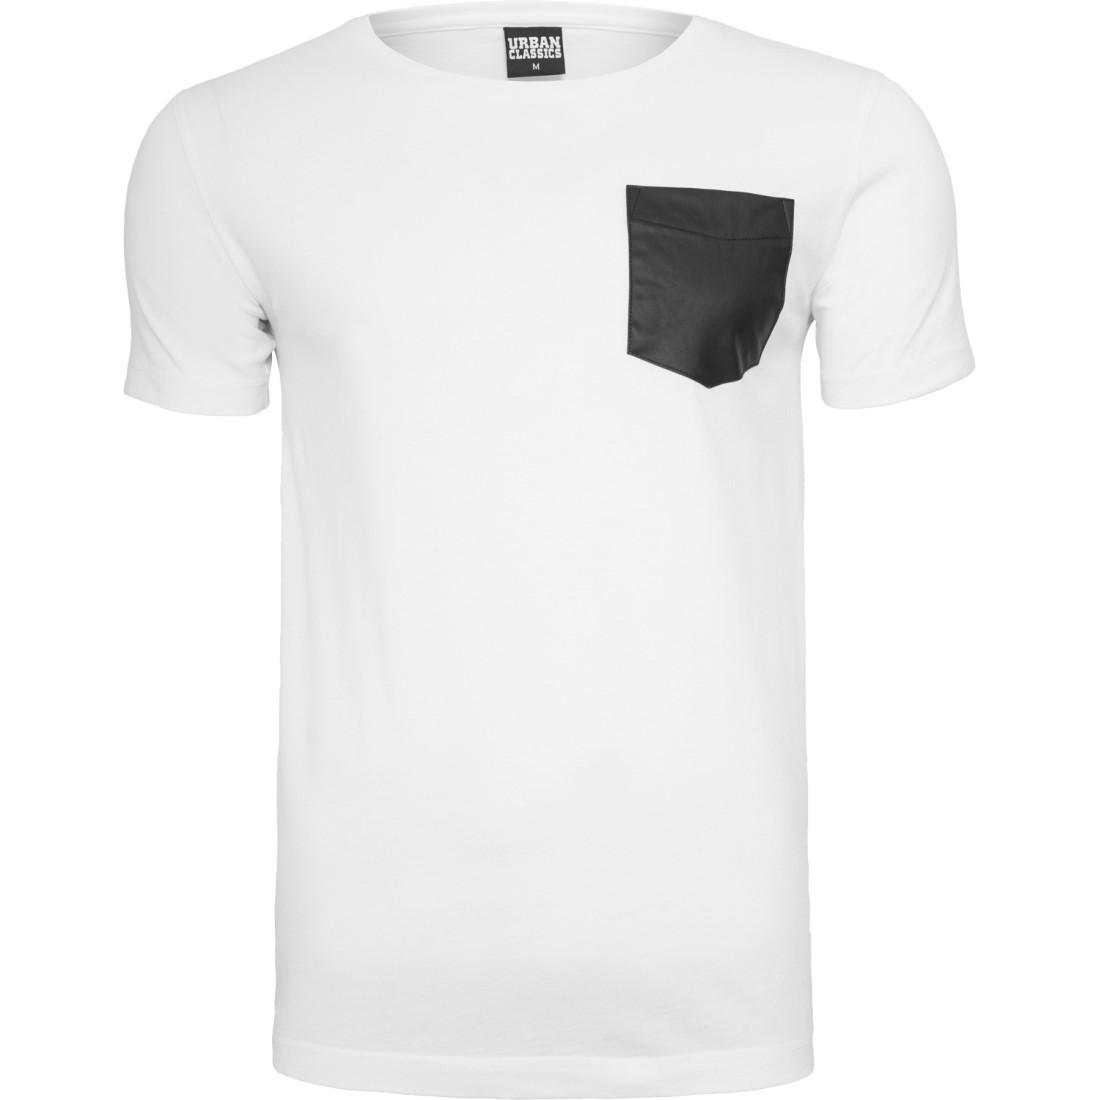 Urban-Classics-SLUB-Shirt-with-Imitation-Leather-Pocket